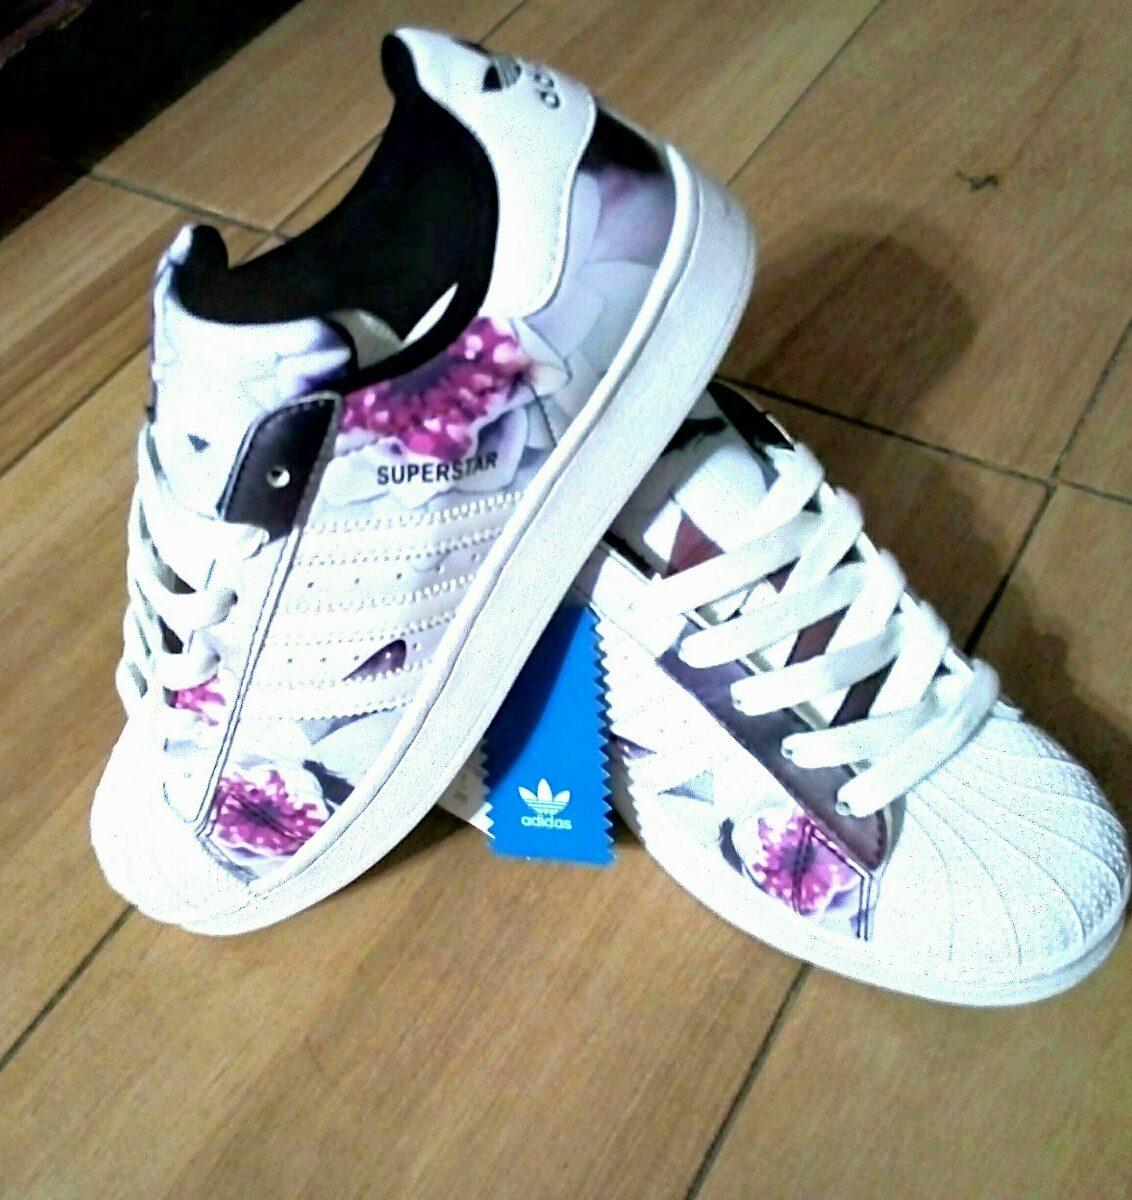 cheap for discount 5ae11 618d3 Concha Concha Mujer 1 Floral 450 Superstar 00 Adidas Originales Originales  Nuevos pTvaxRWwq